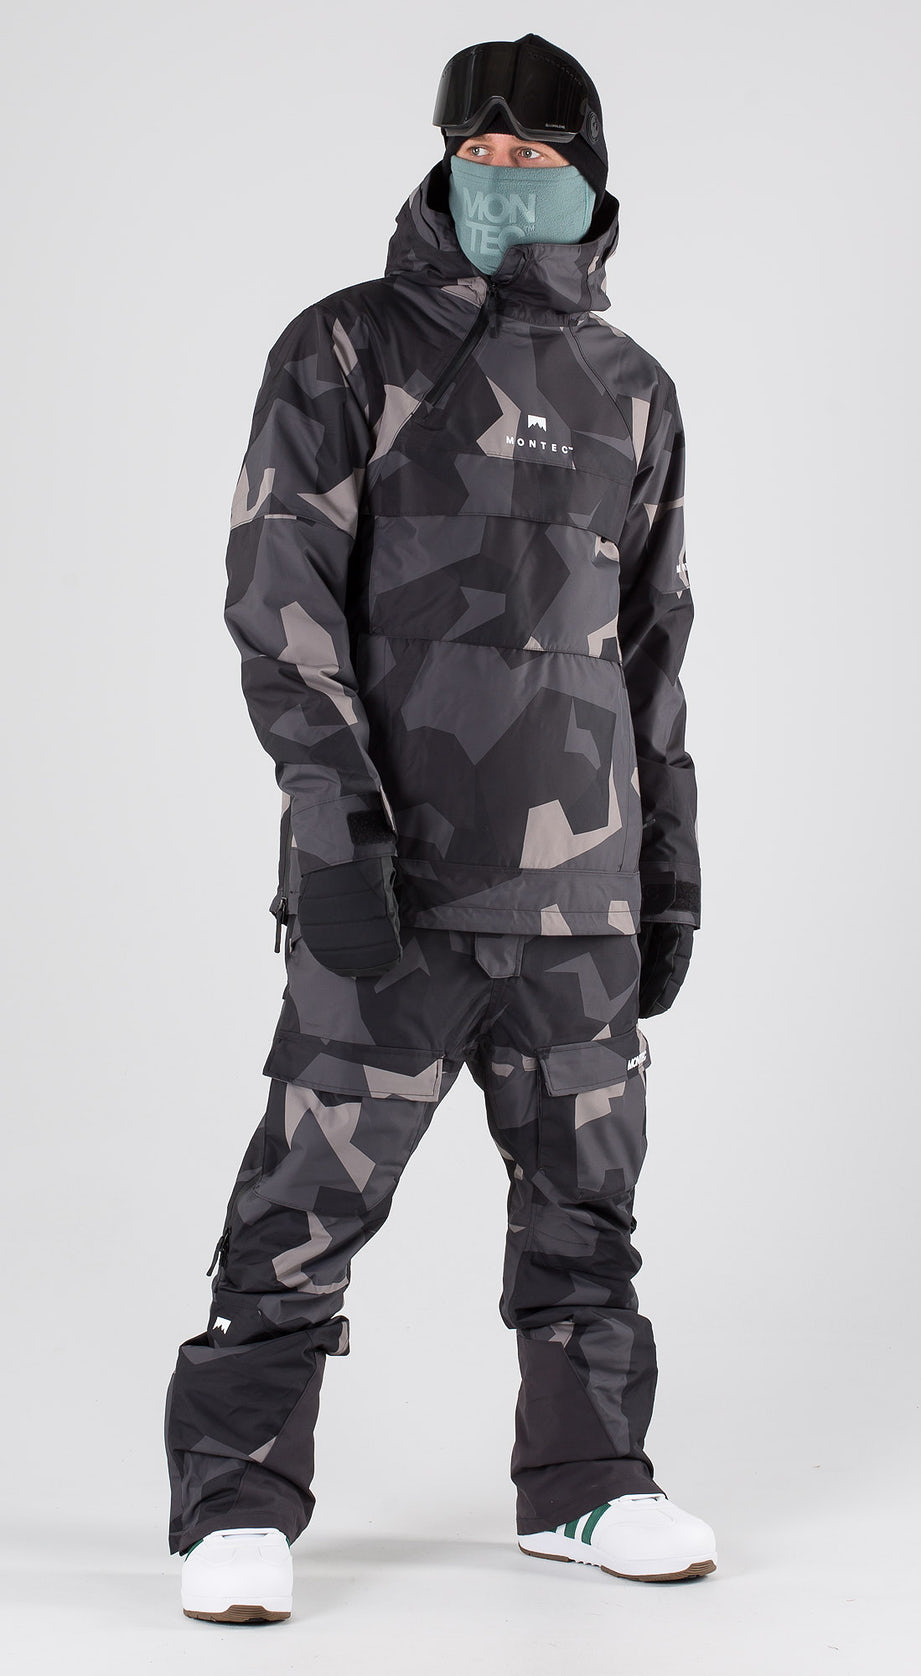 Montec Dune Night Camo Snowboard clothing Multi